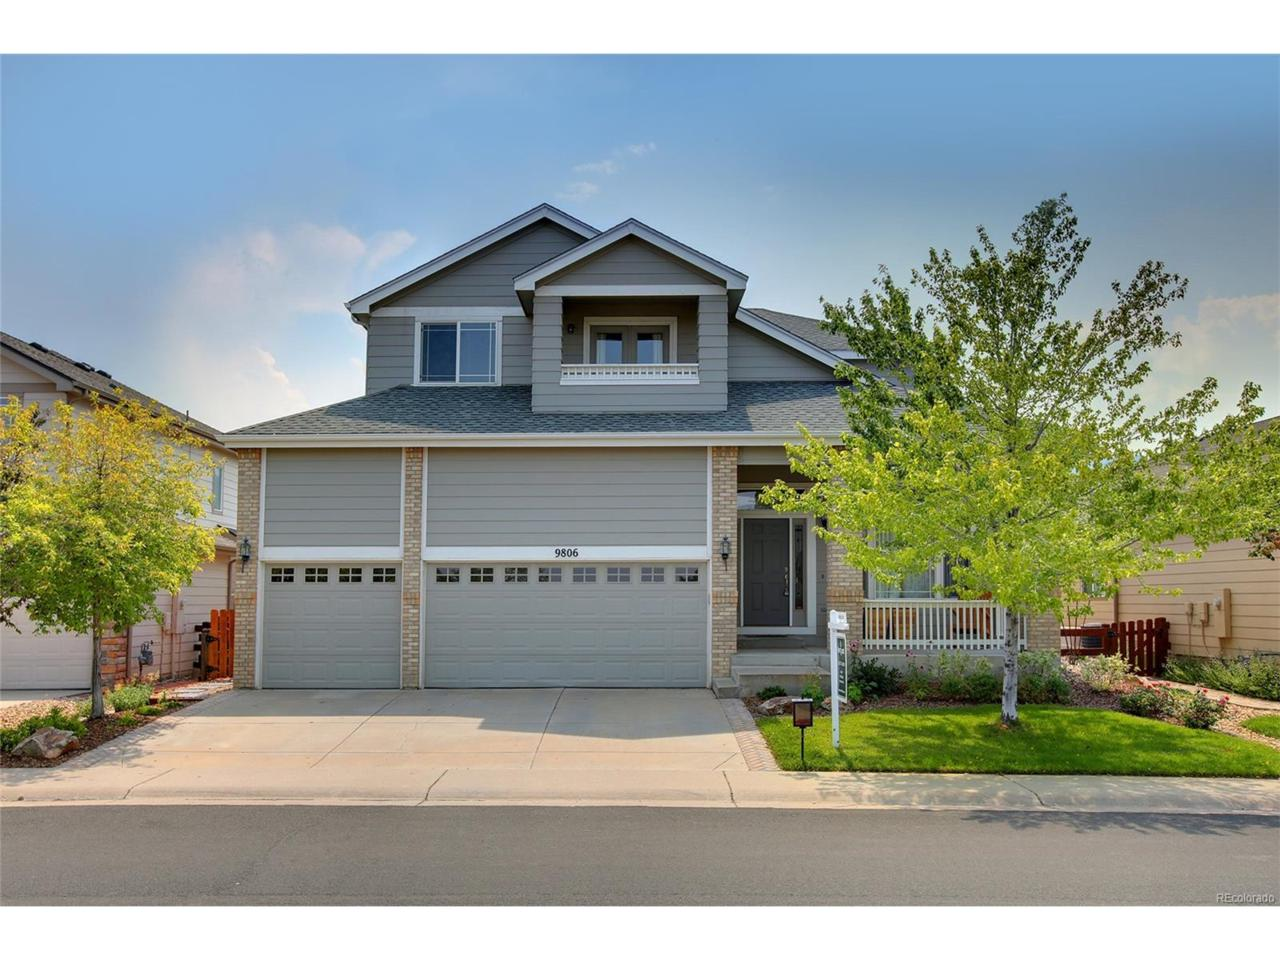 9806 S Crystal Lake Drive, Littleton, CO 80125 (MLS #8862693) :: 8z Real Estate